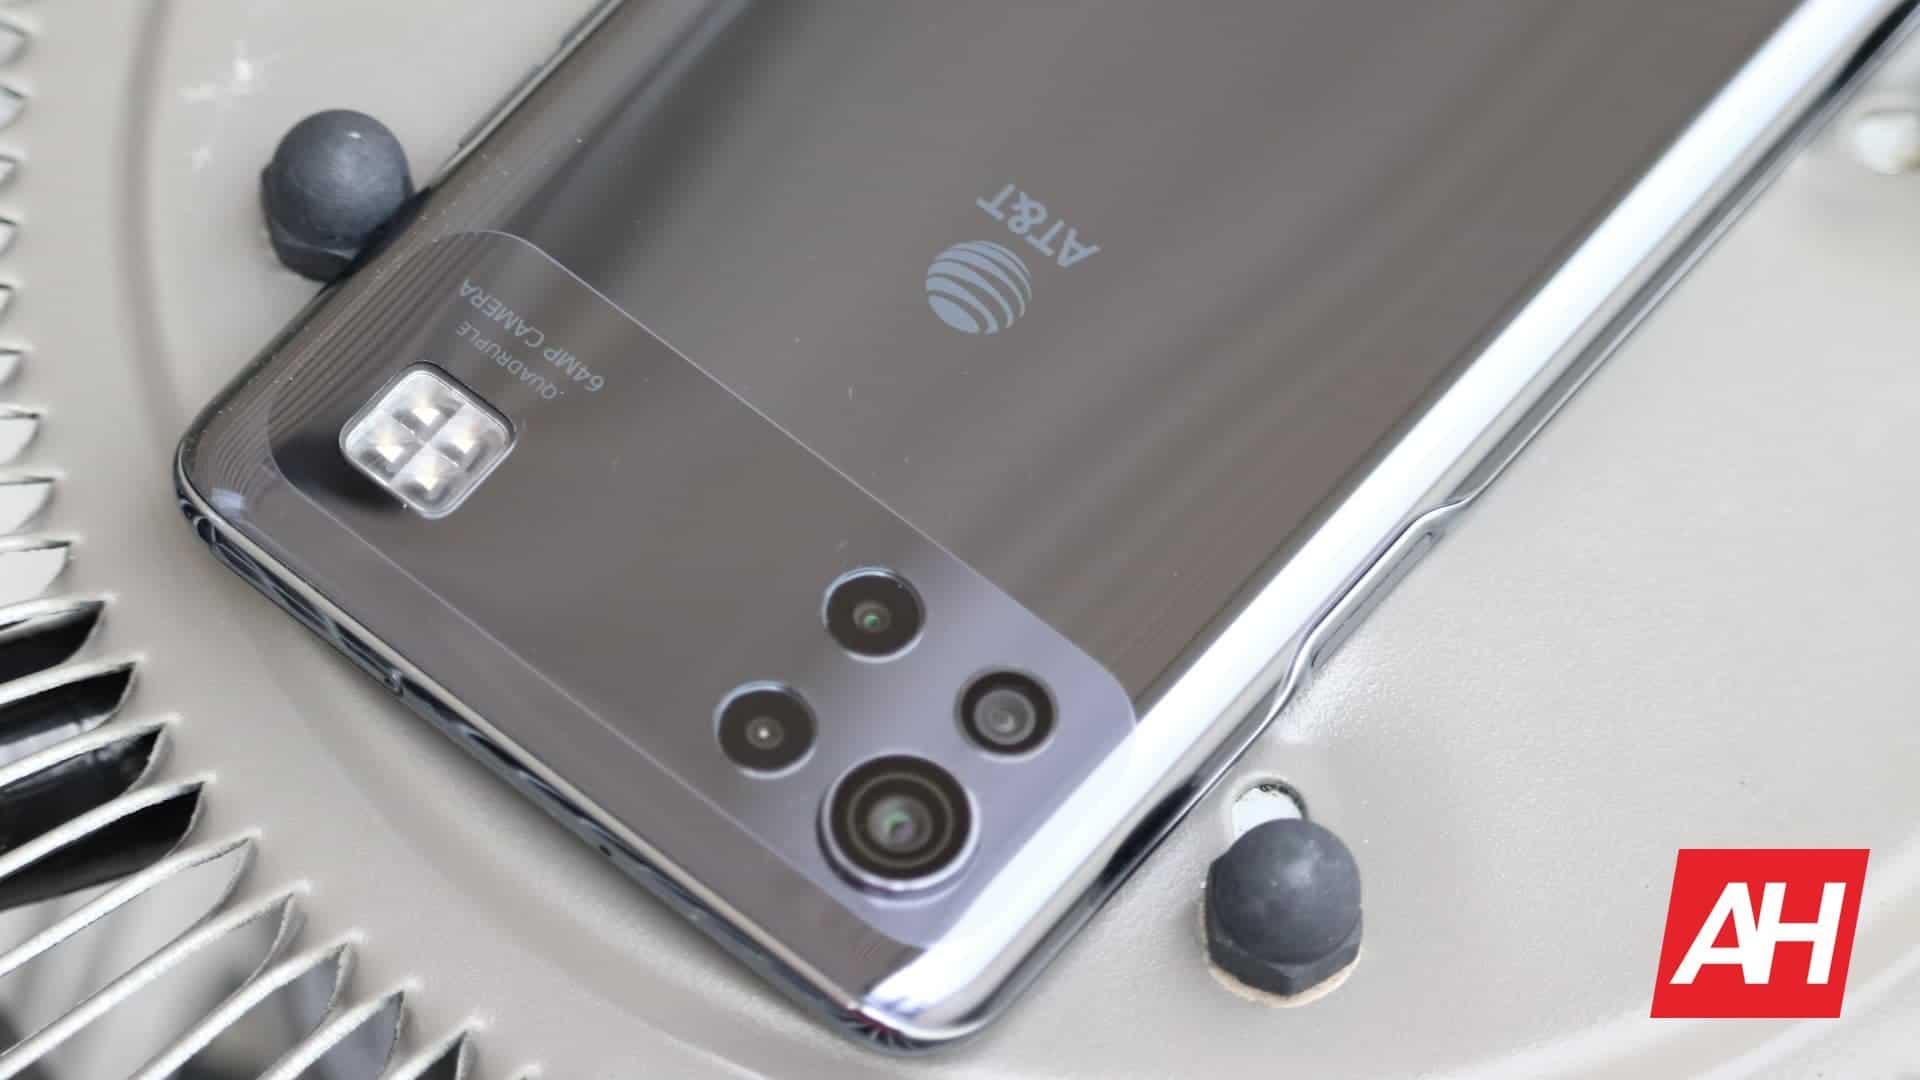 01 4 LG K92 5G Review Hardware DG AH 2020